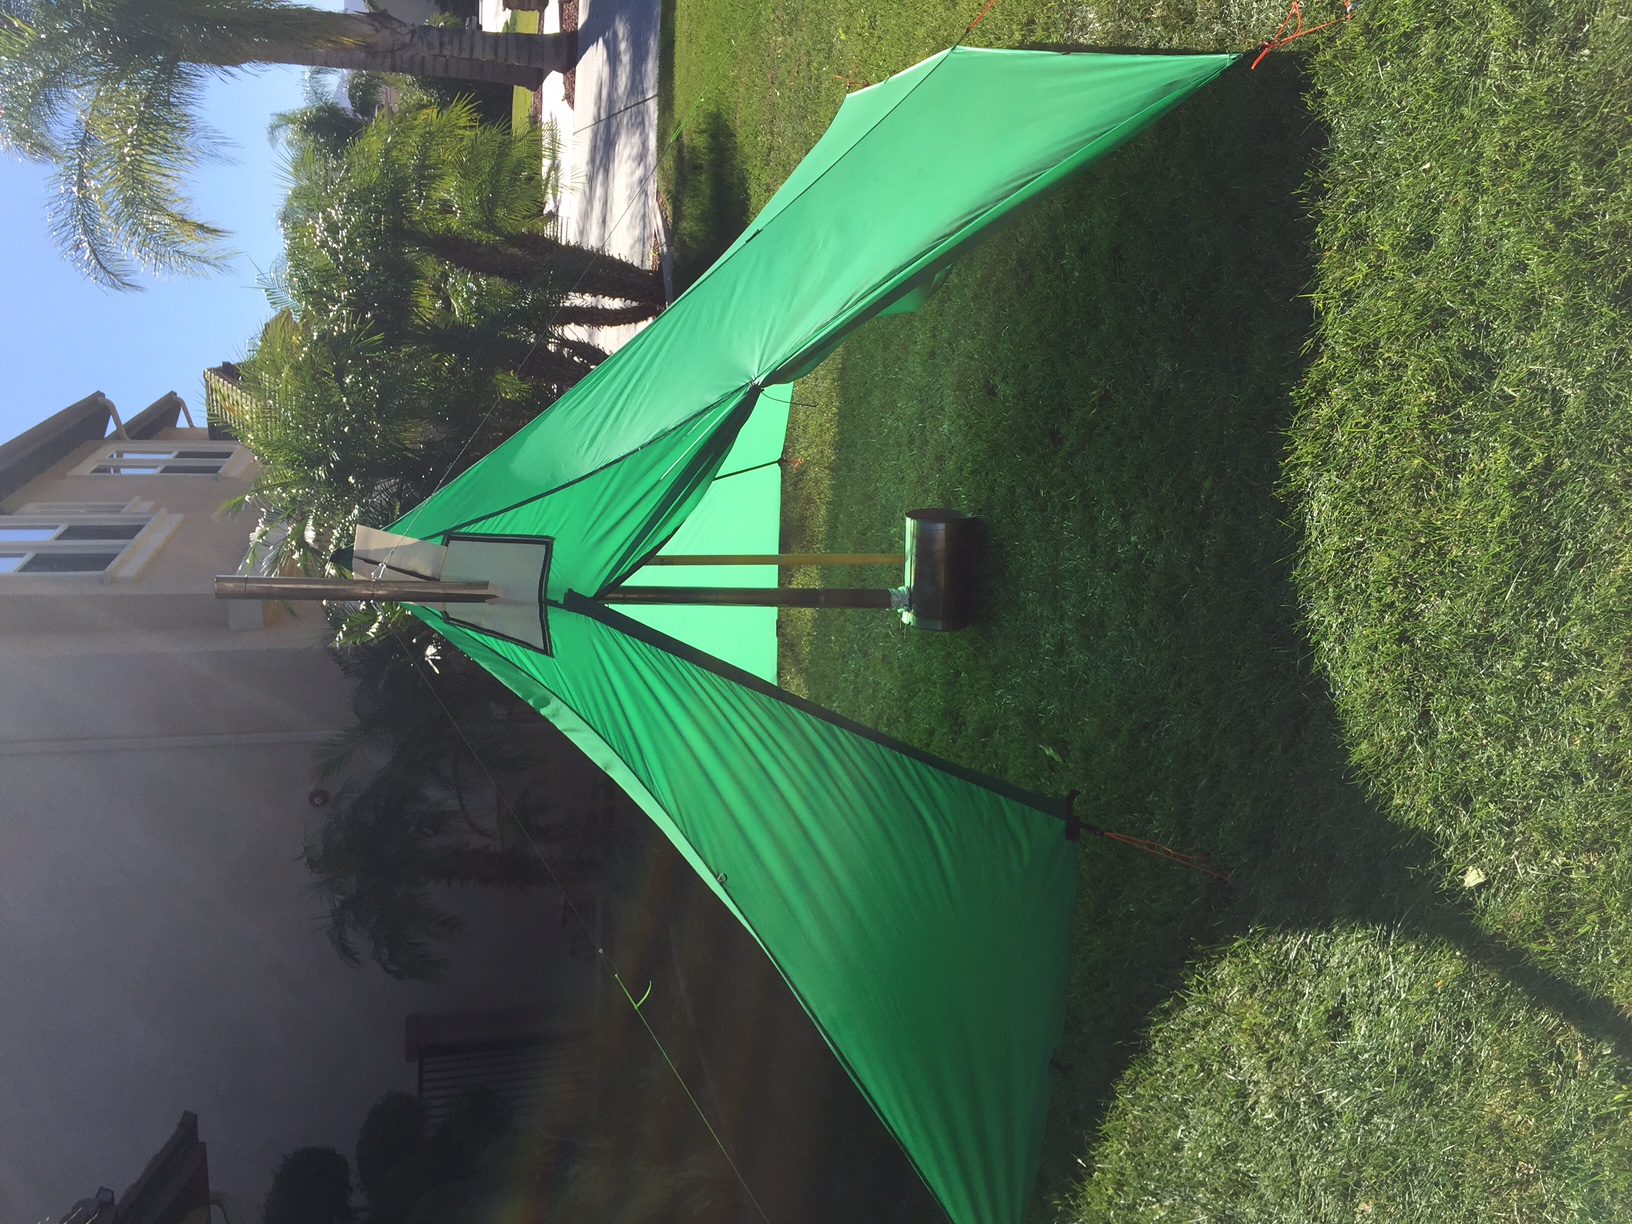 IMG_0718-1.jpg & FS: Titanium Goat Titanium Tent Stove u0026 Bearpaw Pyramid Hot Tent ...